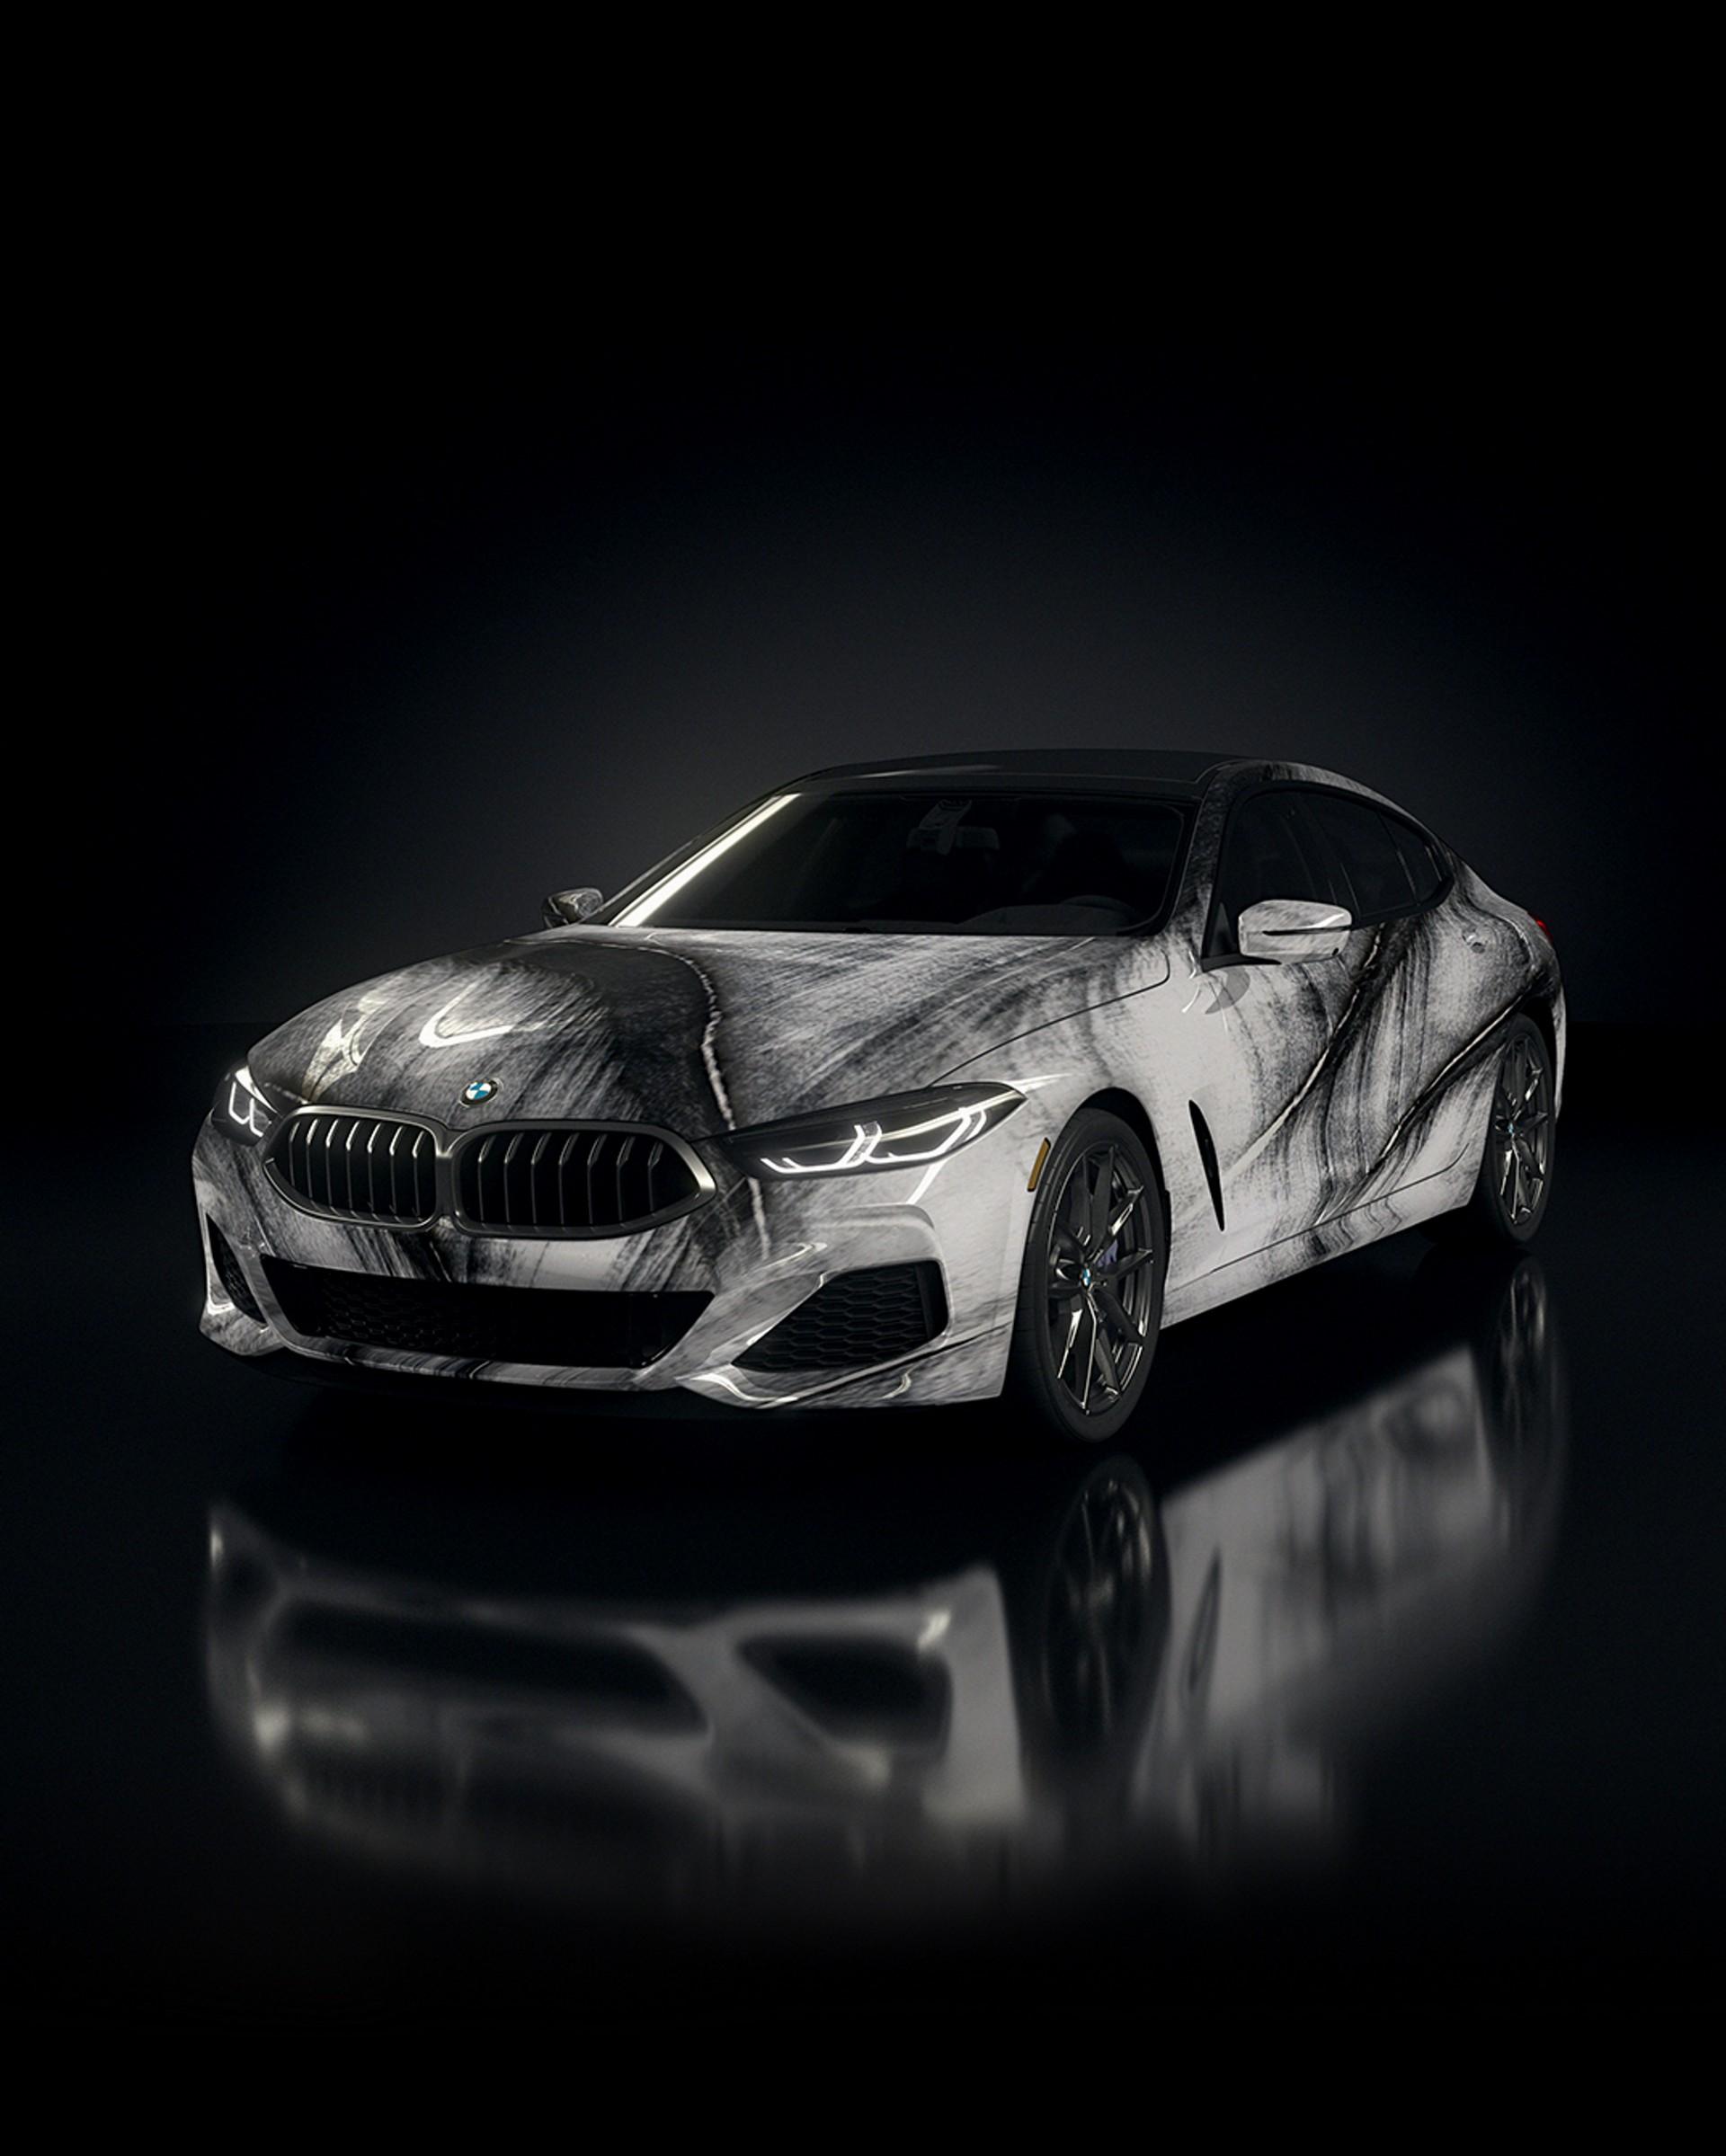 BMW-8-Series-Gran-Coupe-art-car-7